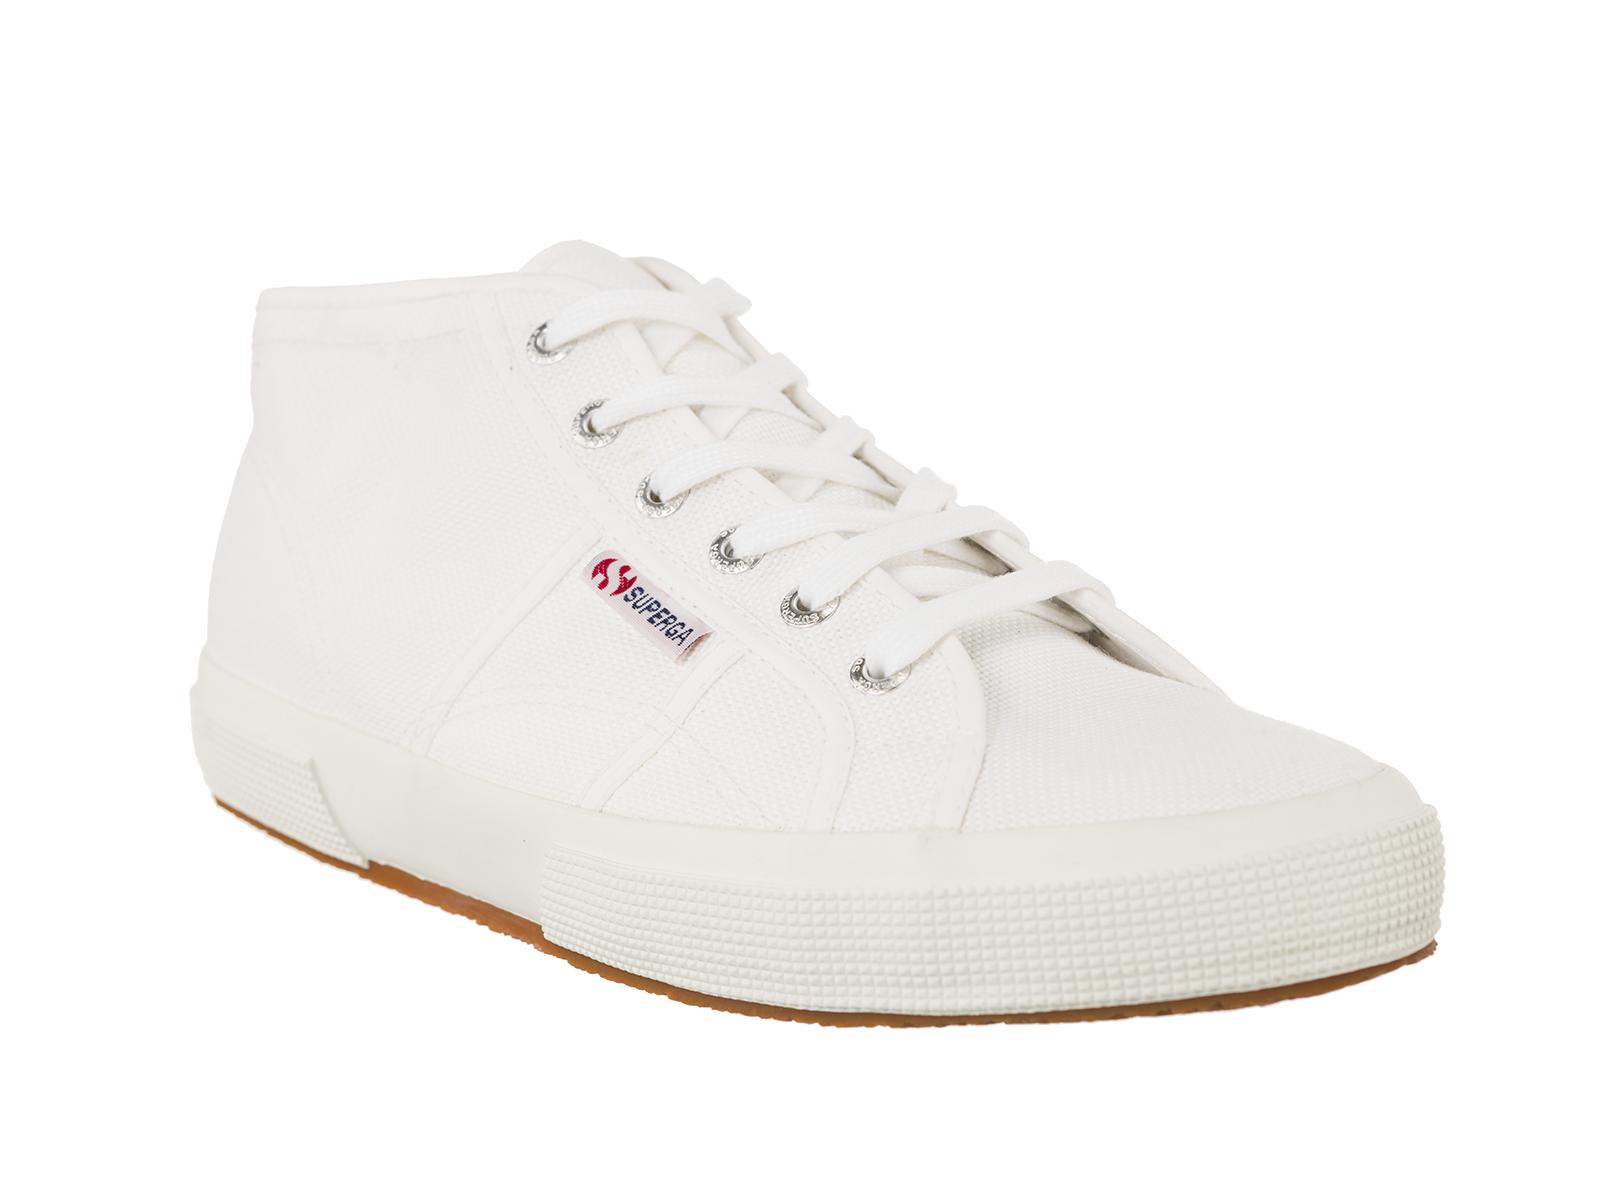 Superga Sneaker Scarpe 2754 COTU Mid Cut BIANCO WHITE TG. 37